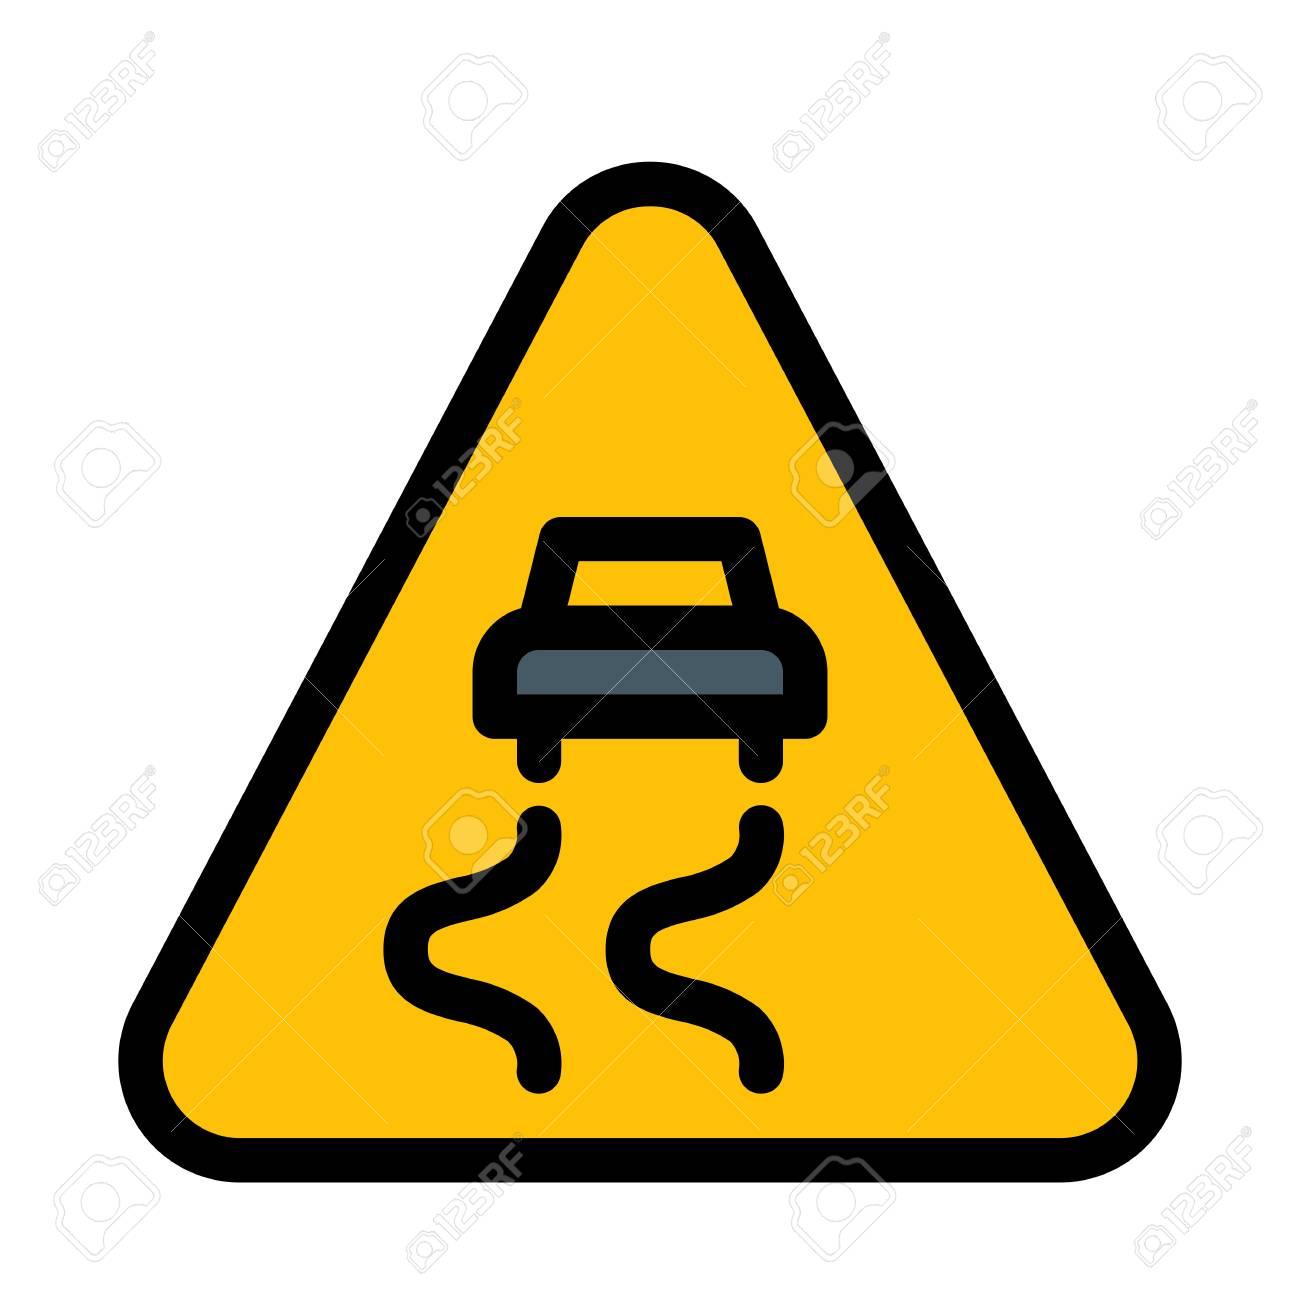 Slippery Road Warning - 125722199